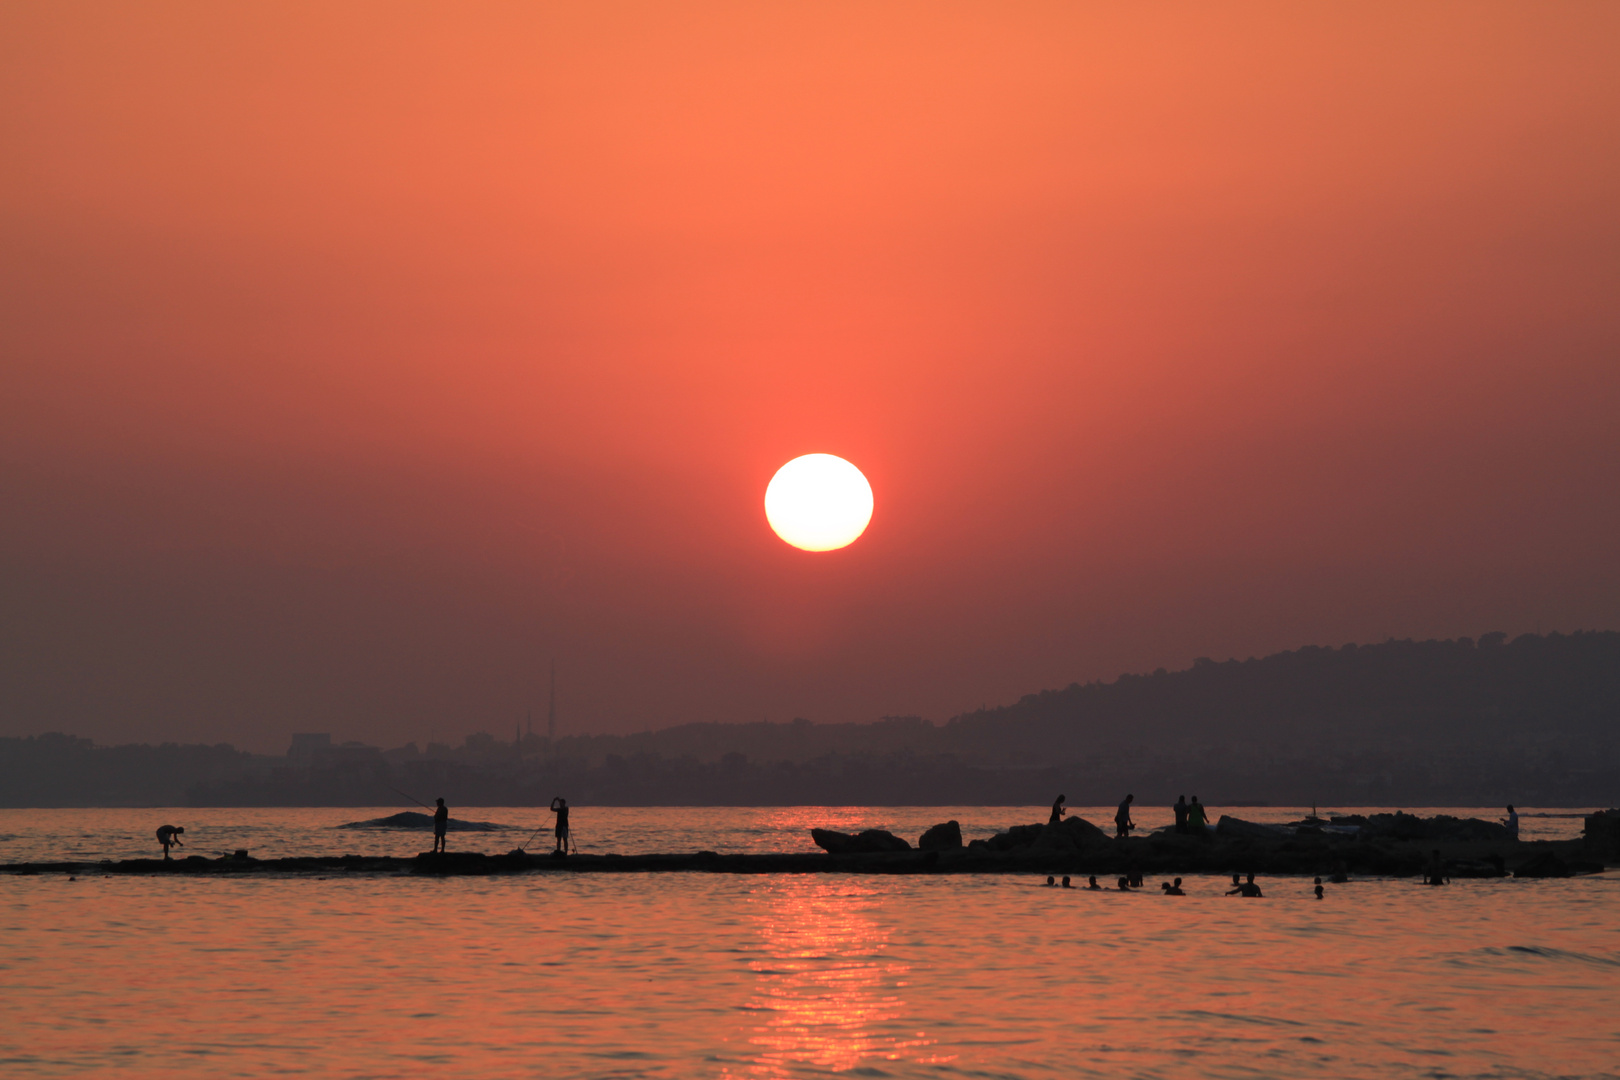 Sonnenuntergang 28.06.2013 (2)